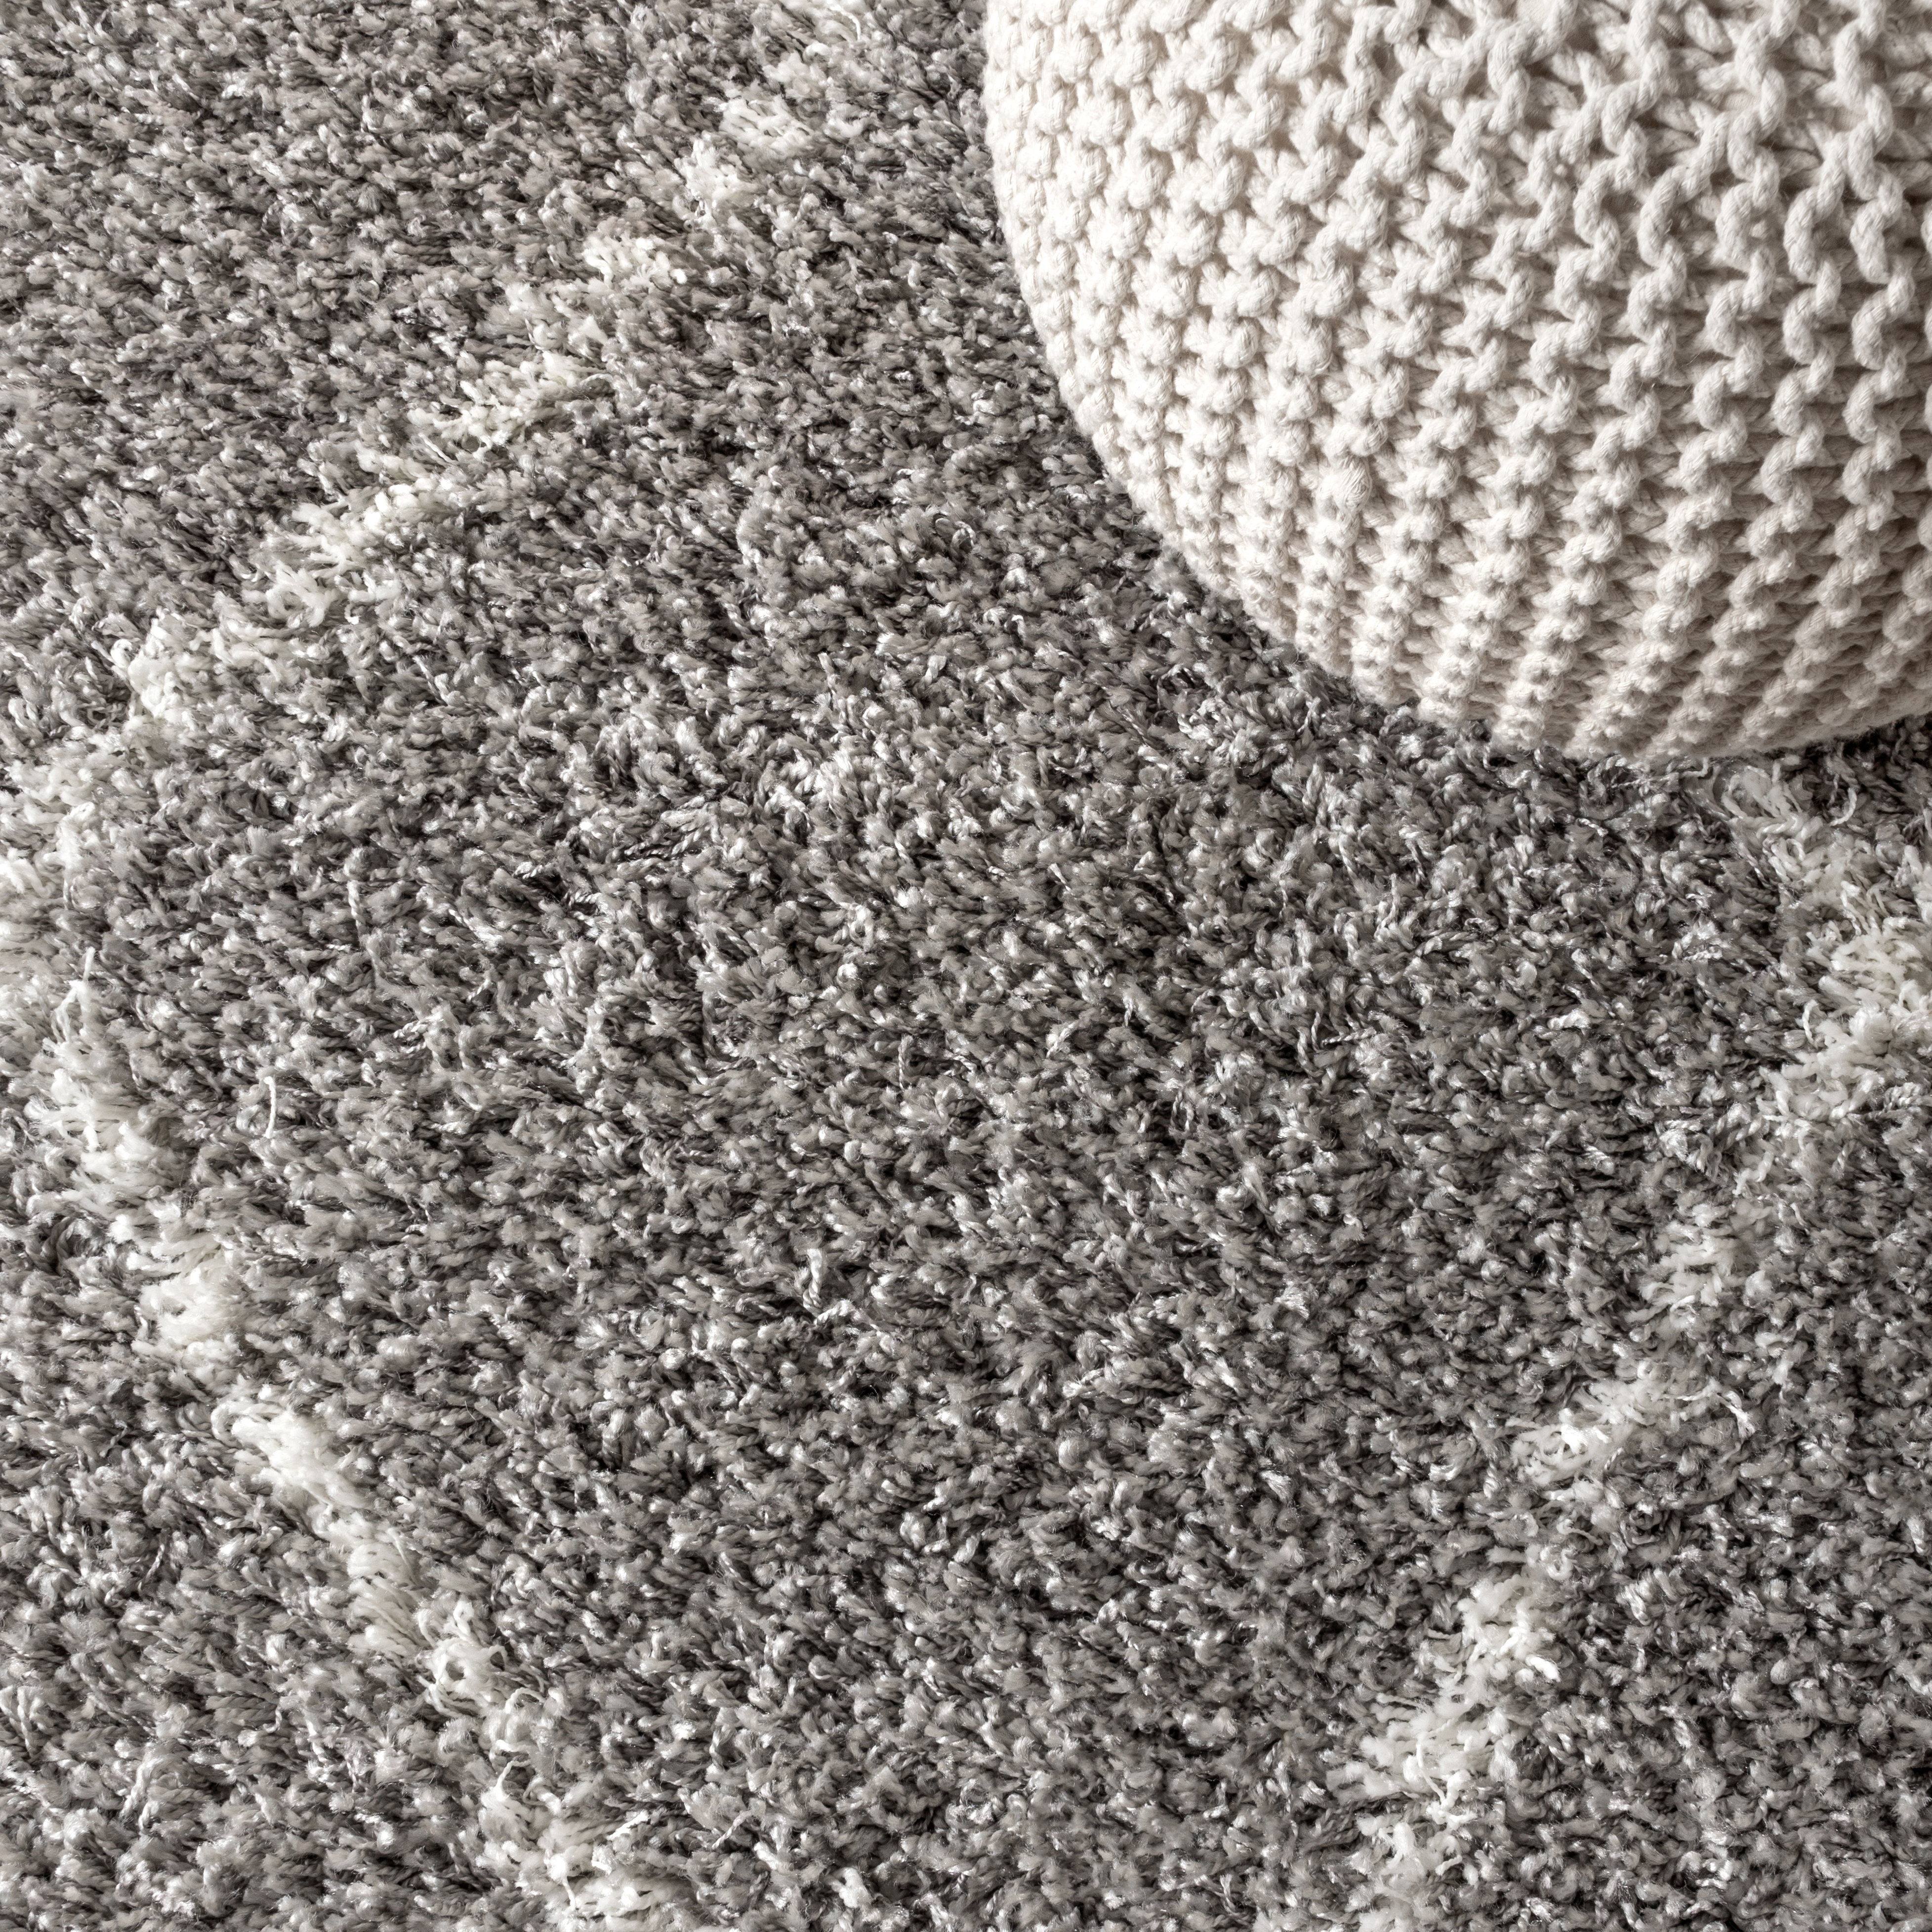 Mercer Shag Plush Tassel Moroccan Geometric Trellis Grey/Cream 3 ft. x 5 ft. Area Rug